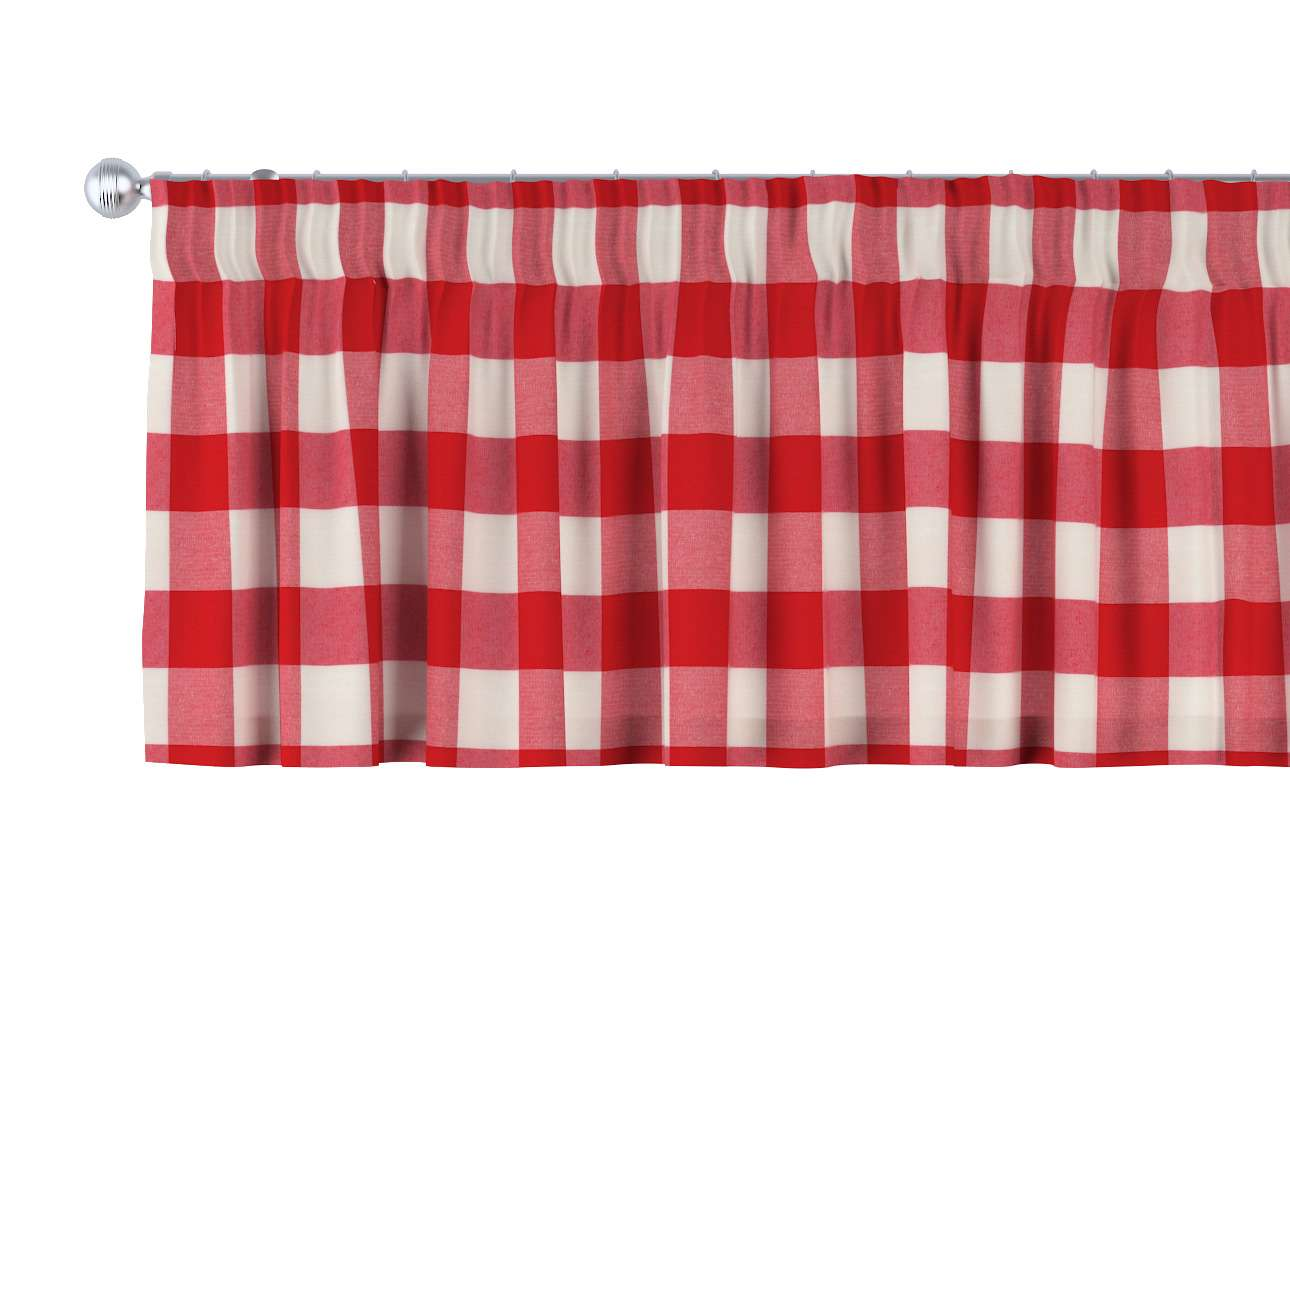 Pencil pleat pelmet 130 × 40 cm (51 × 16 inch) in collection Quadro, fabric: 136-18